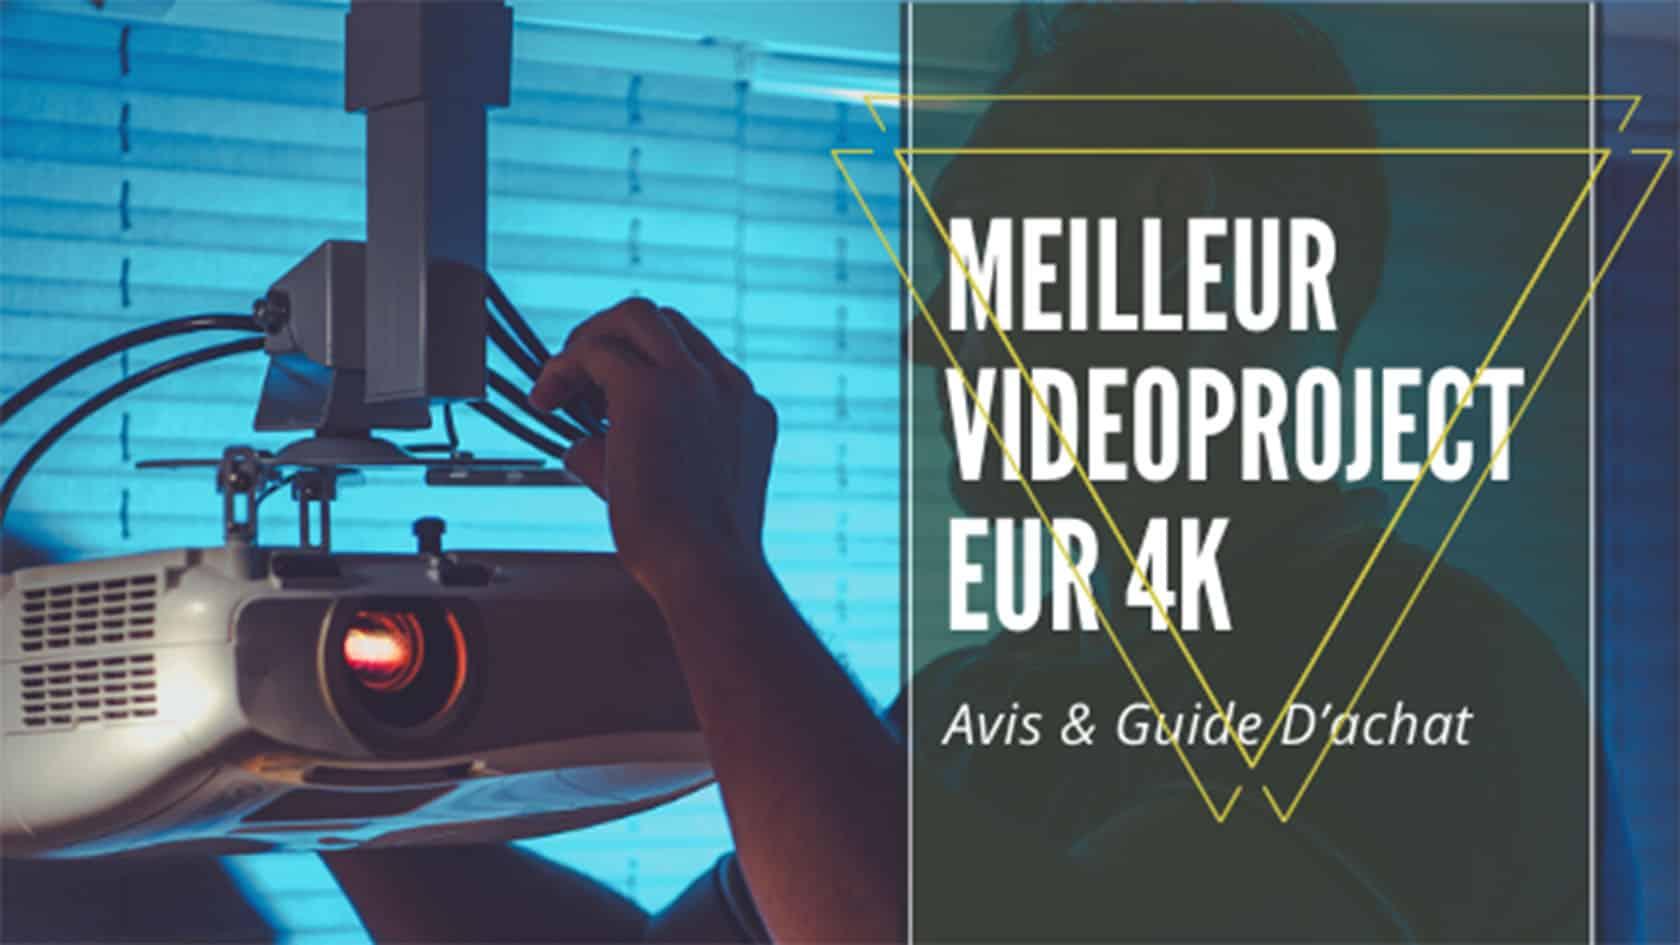 Meilleur Videoprojecteur 4k